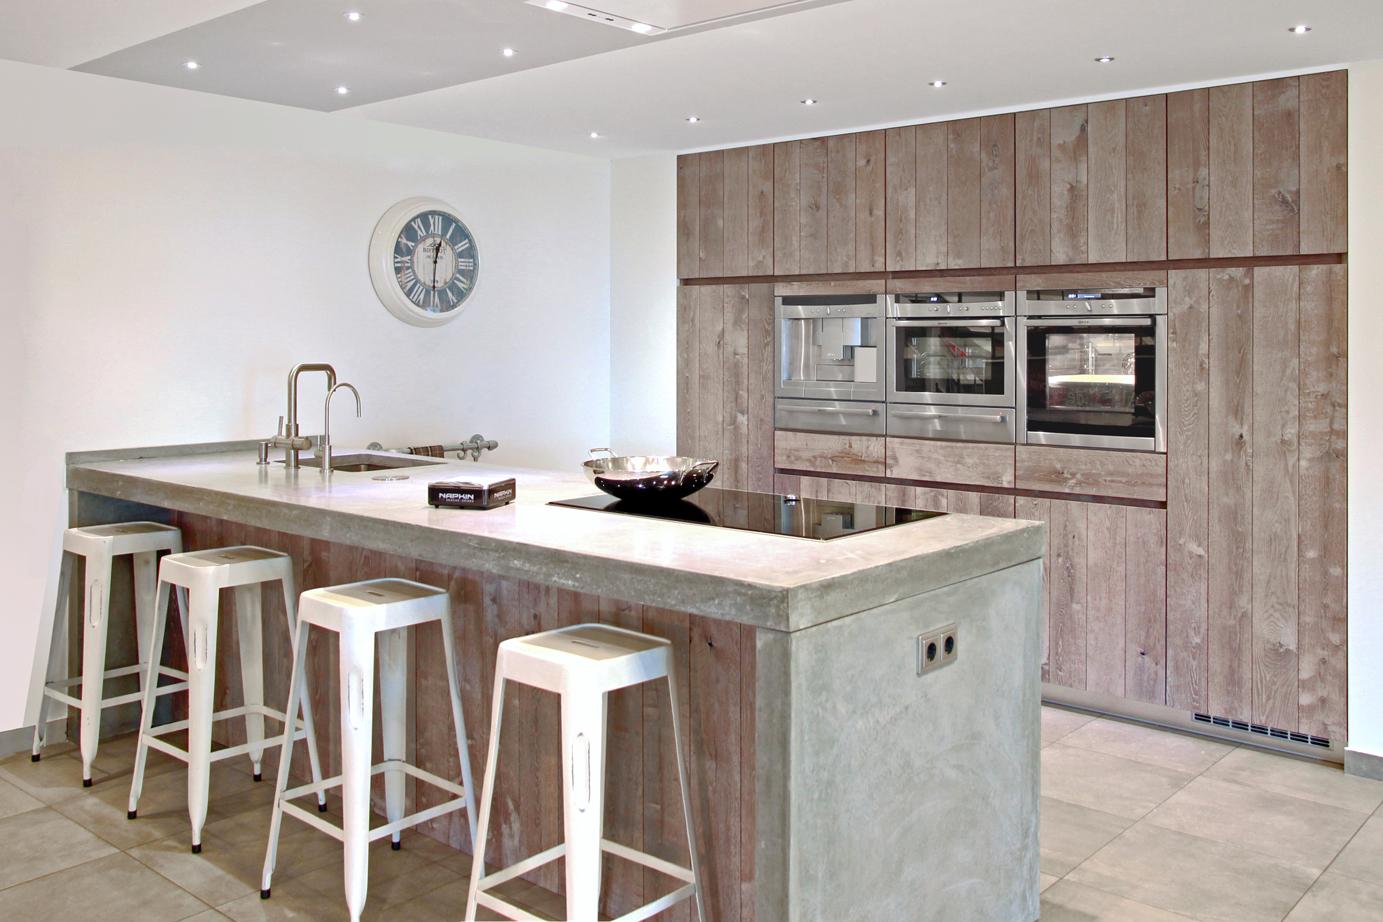 Keuken Losse Bar : Luxe keukens excellentic of op maat arma